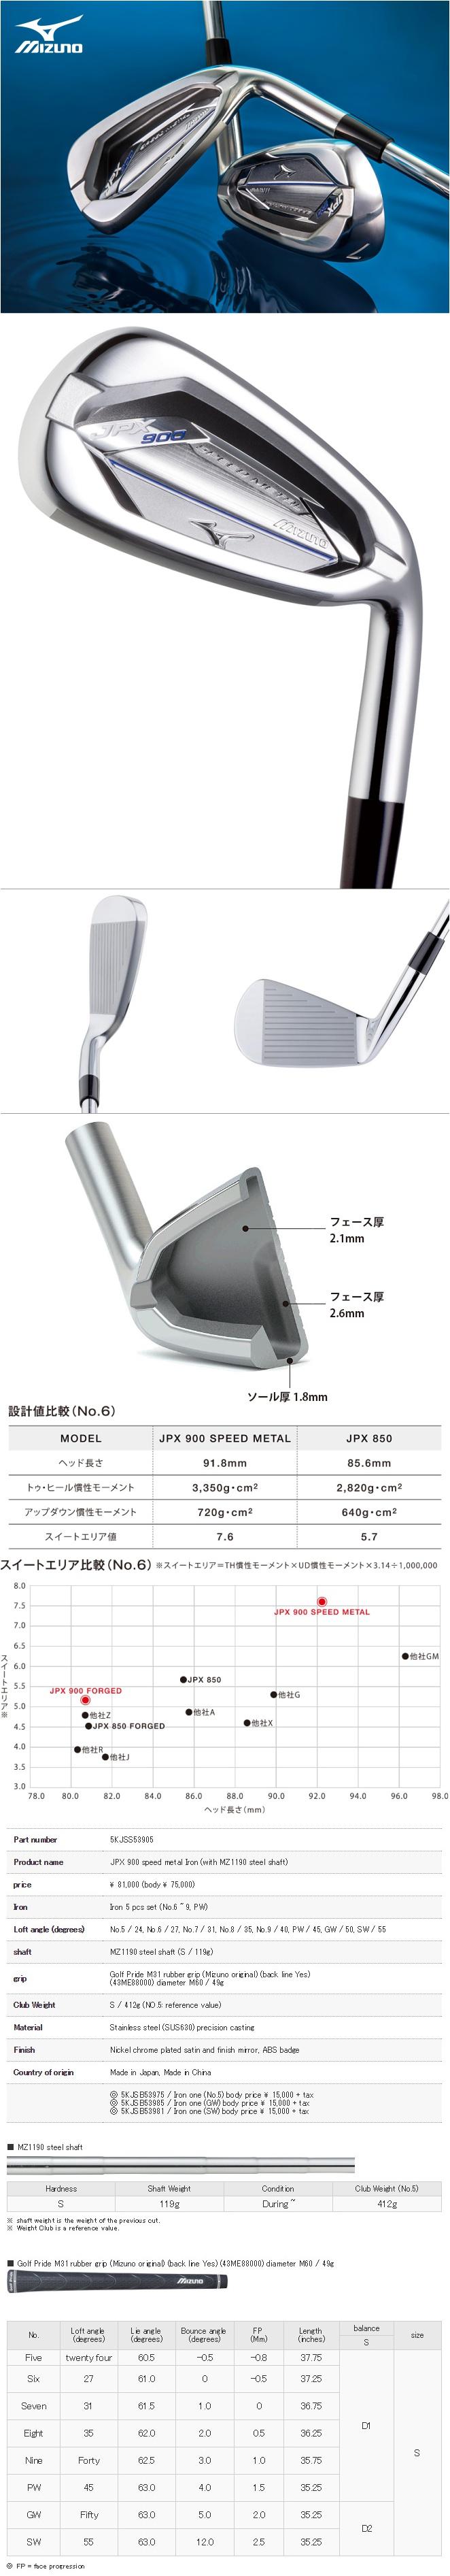 Mizuno JPX 900 Speed Metal Iron